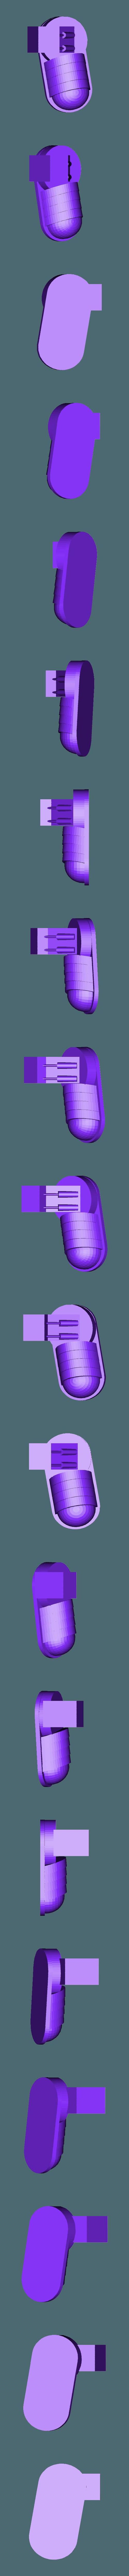 left_foot.stl Télécharger fichier STL gratuit Ork Great Gargant 6mm Epic Scale Proxy model • Objet à imprimer en 3D, redstarkits